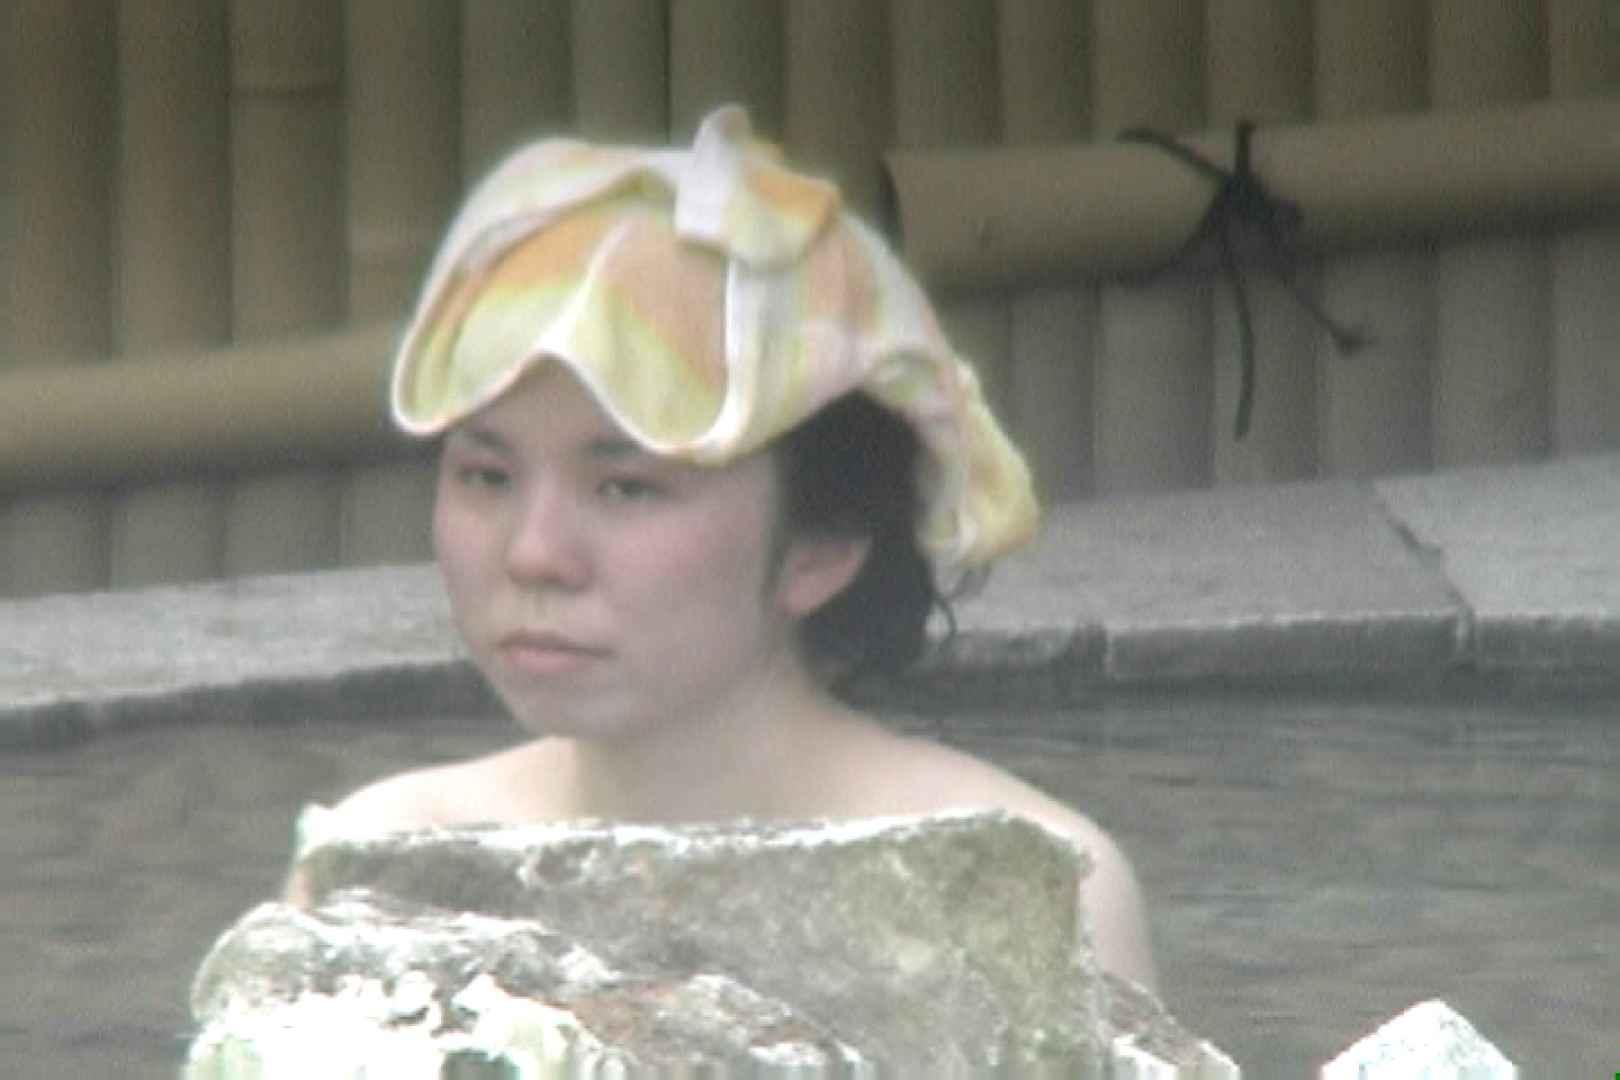 Aquaな露天風呂Vol.687 露天 隠し撮りオマンコ動画紹介 63画像 35